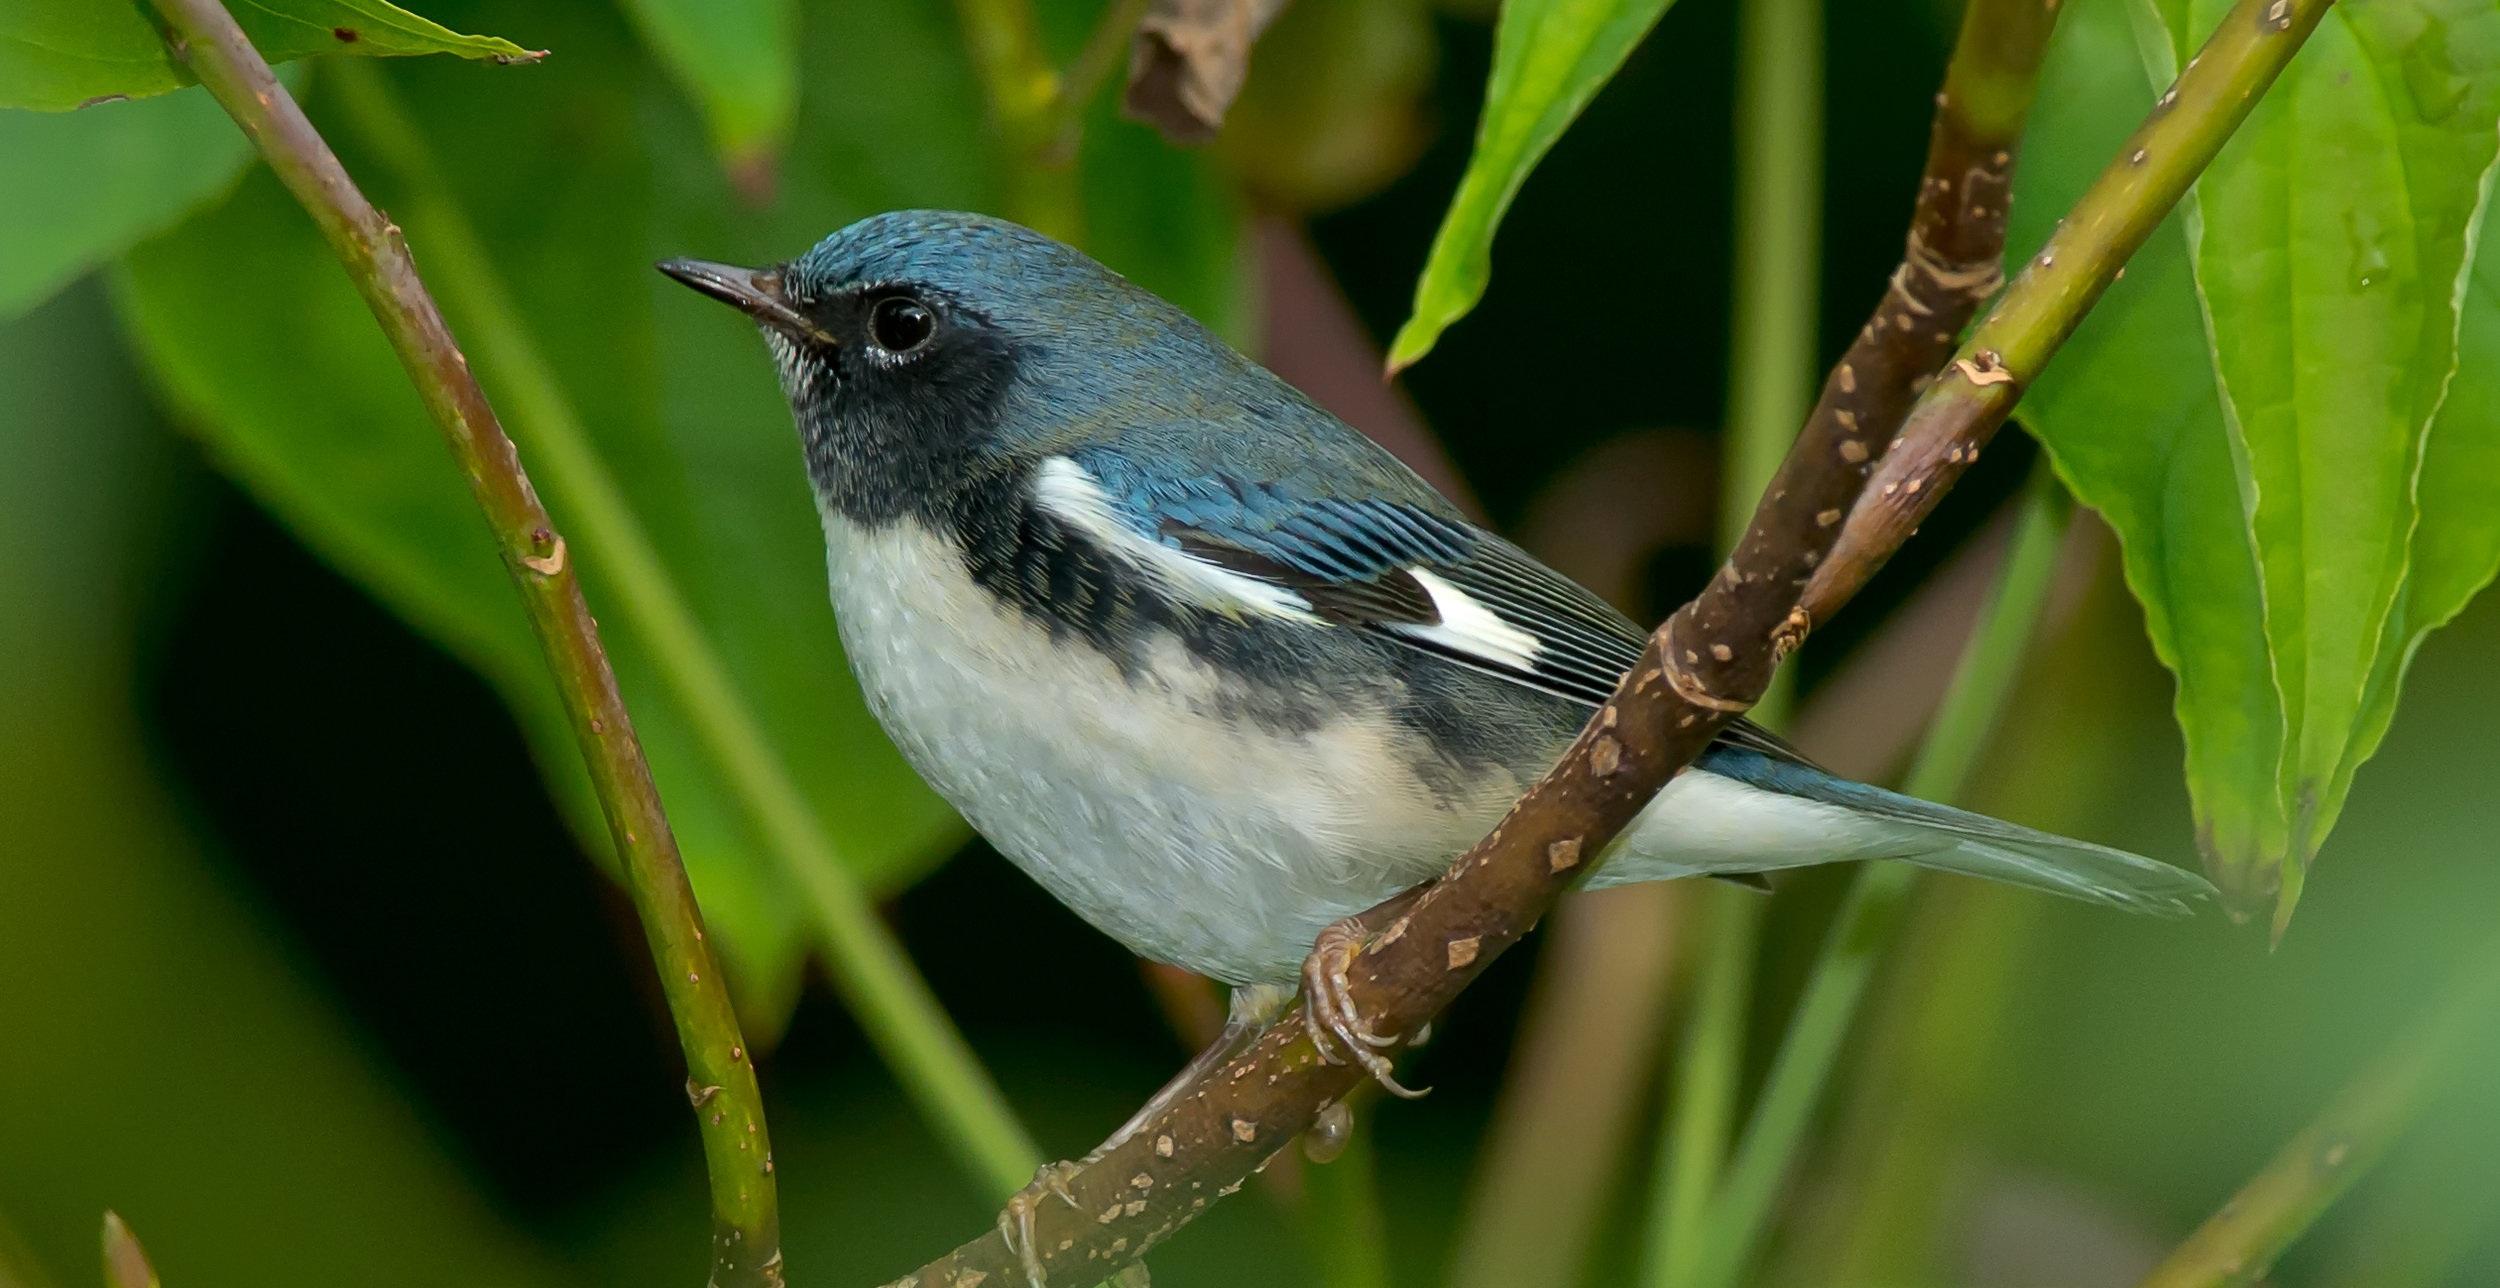 black+throated+blue+warbler.jpg